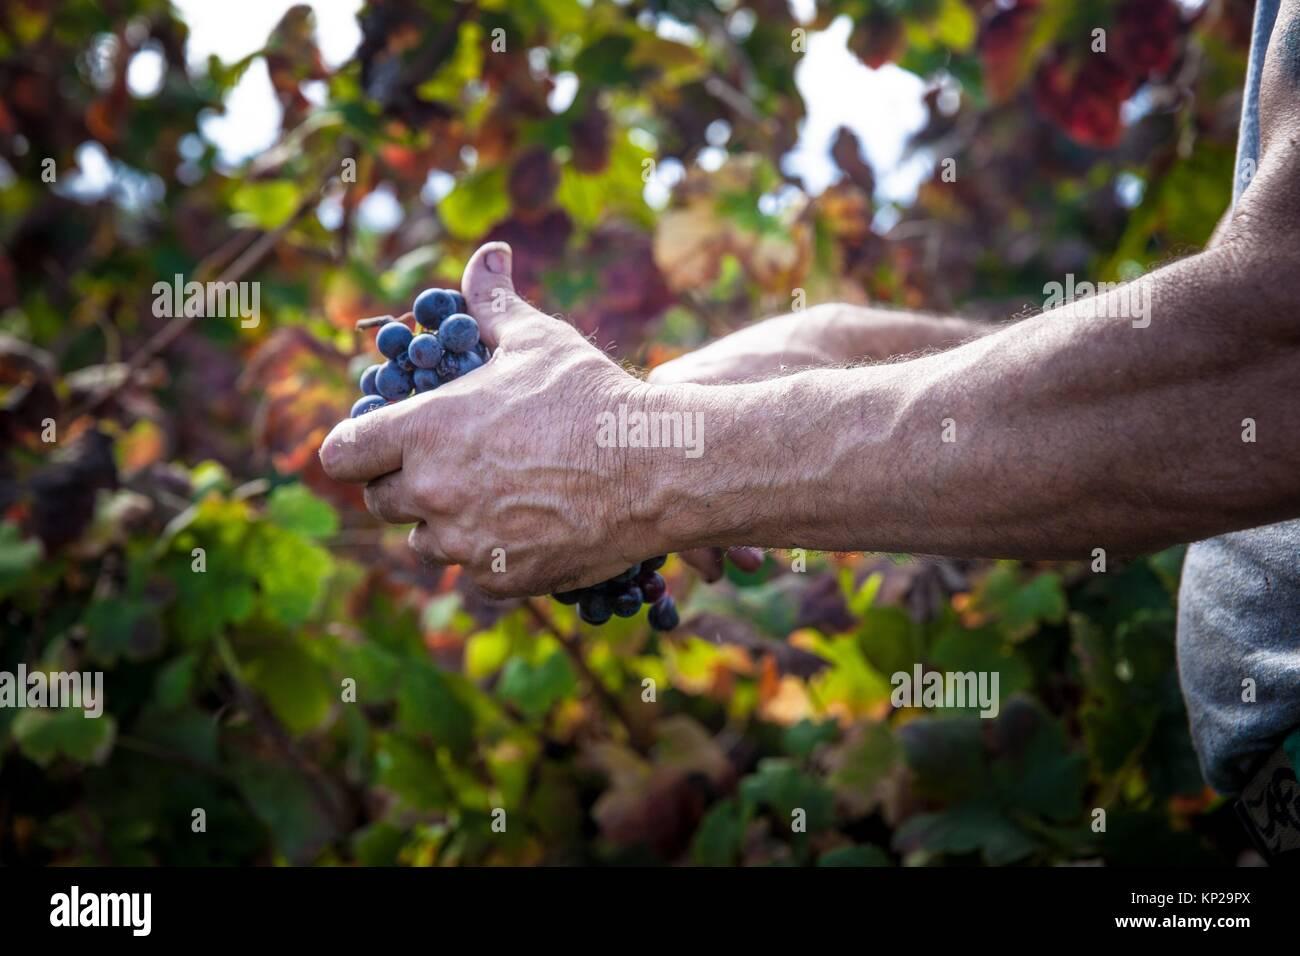 Landworker picking grapes during the grape harvest season in Tenerife island - Stock Image